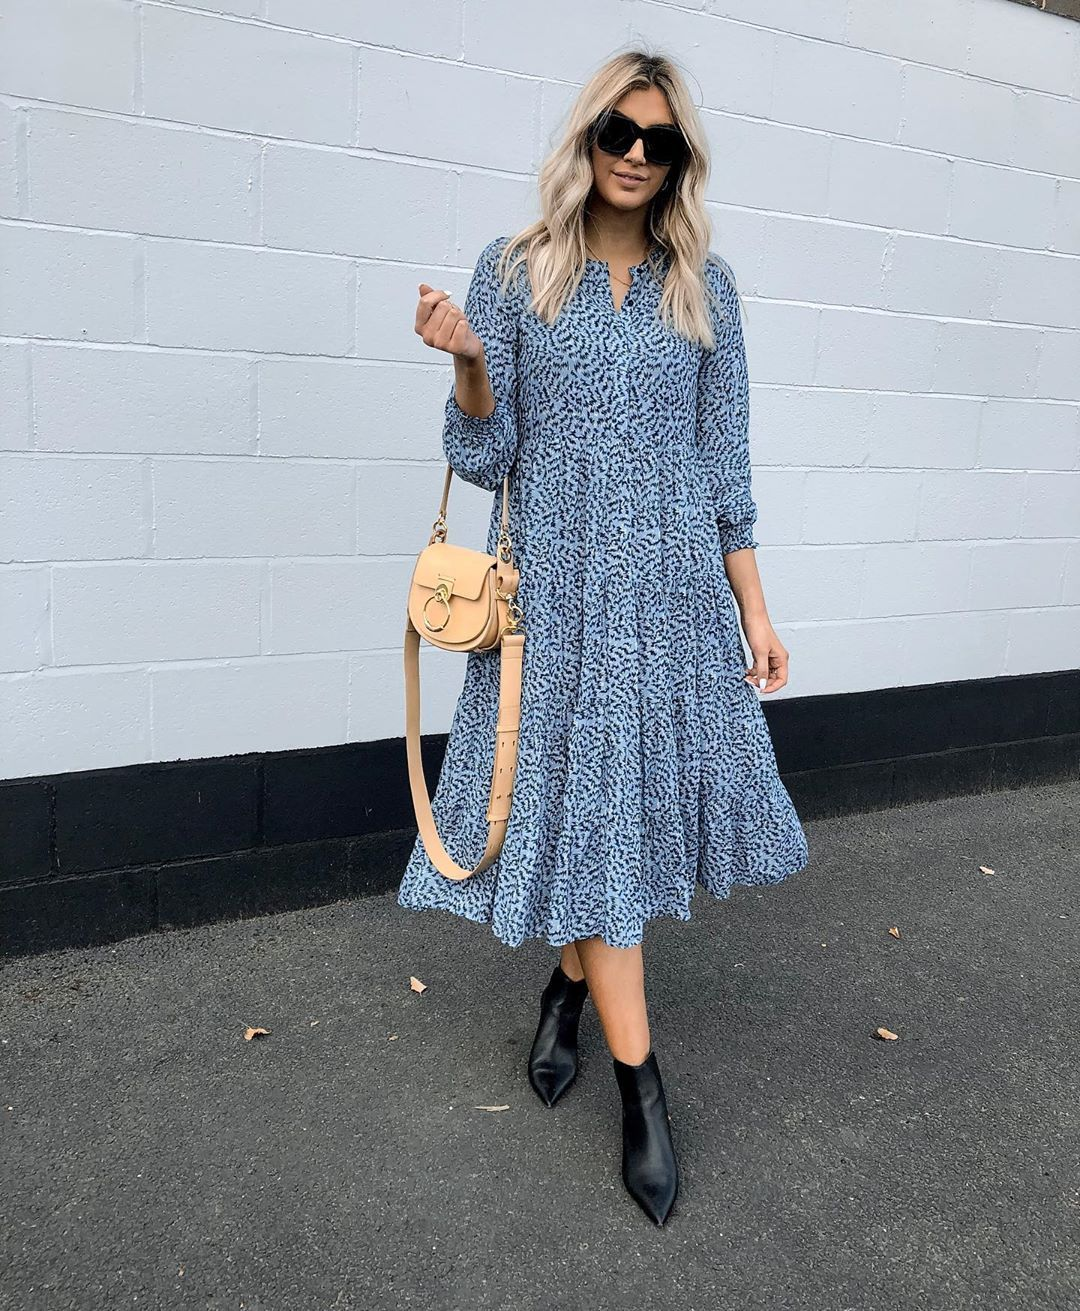 zara outfit 2020 dresses